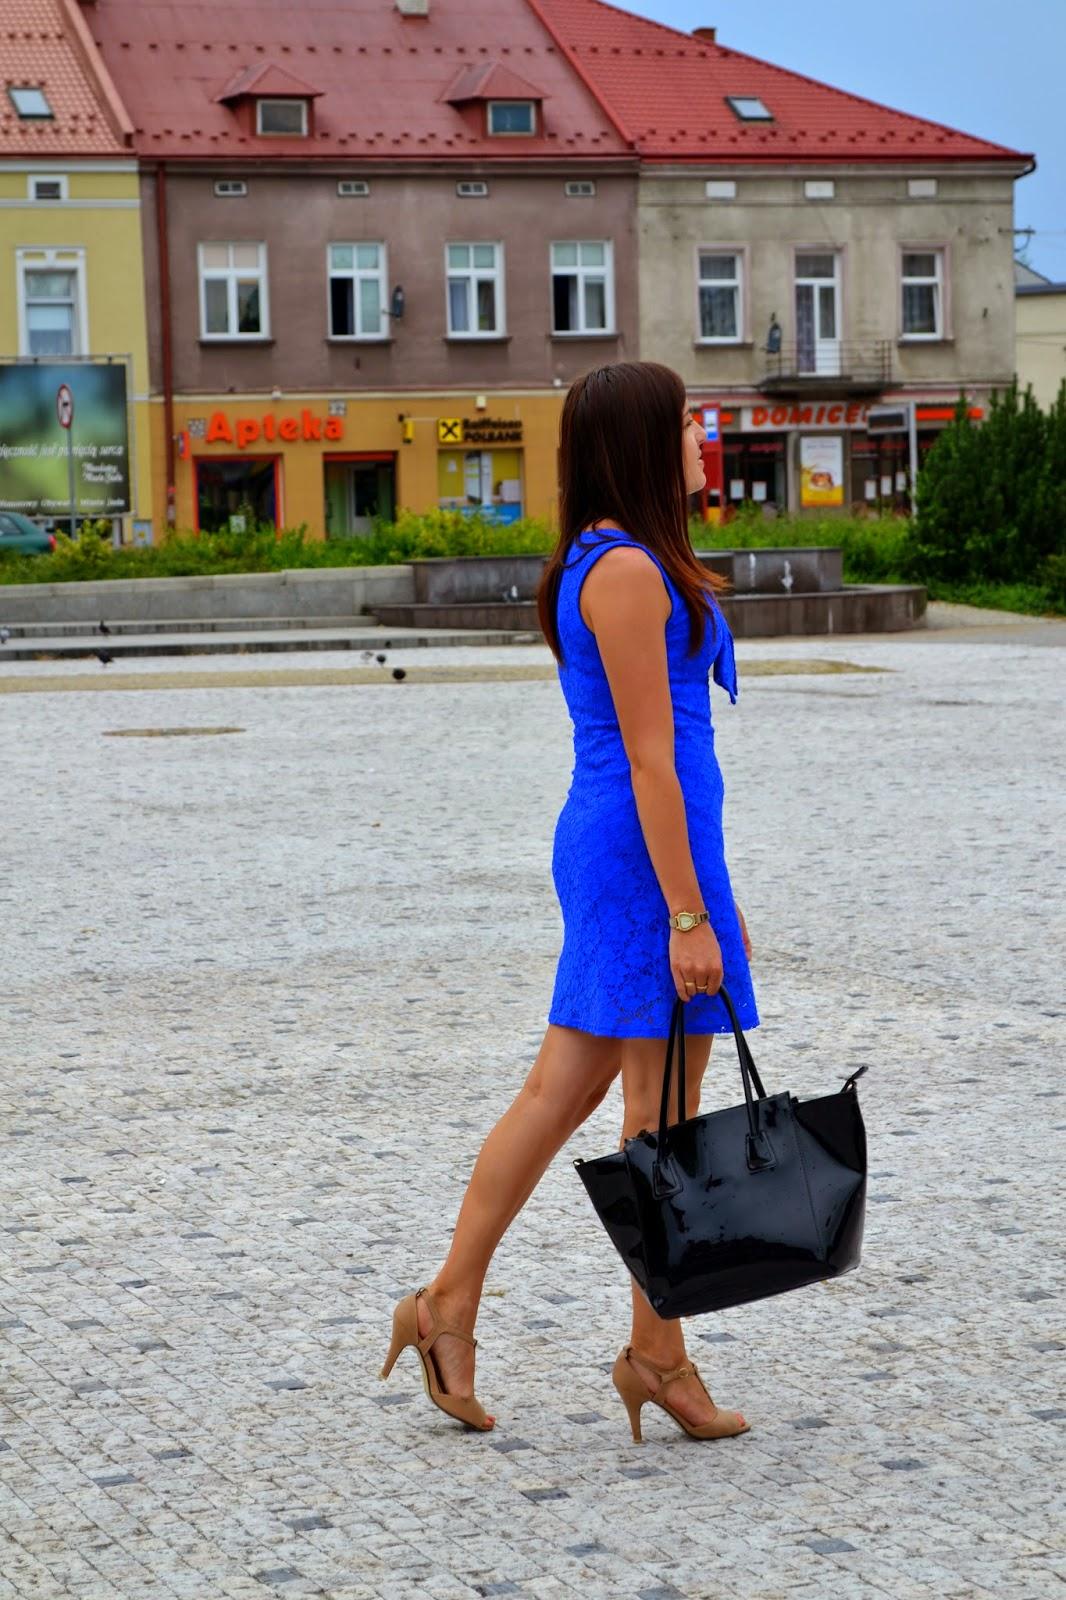 koronkowa sukienka, sukienka z kokardą, dopasowana sukienka koronkowa, niebieska koronka